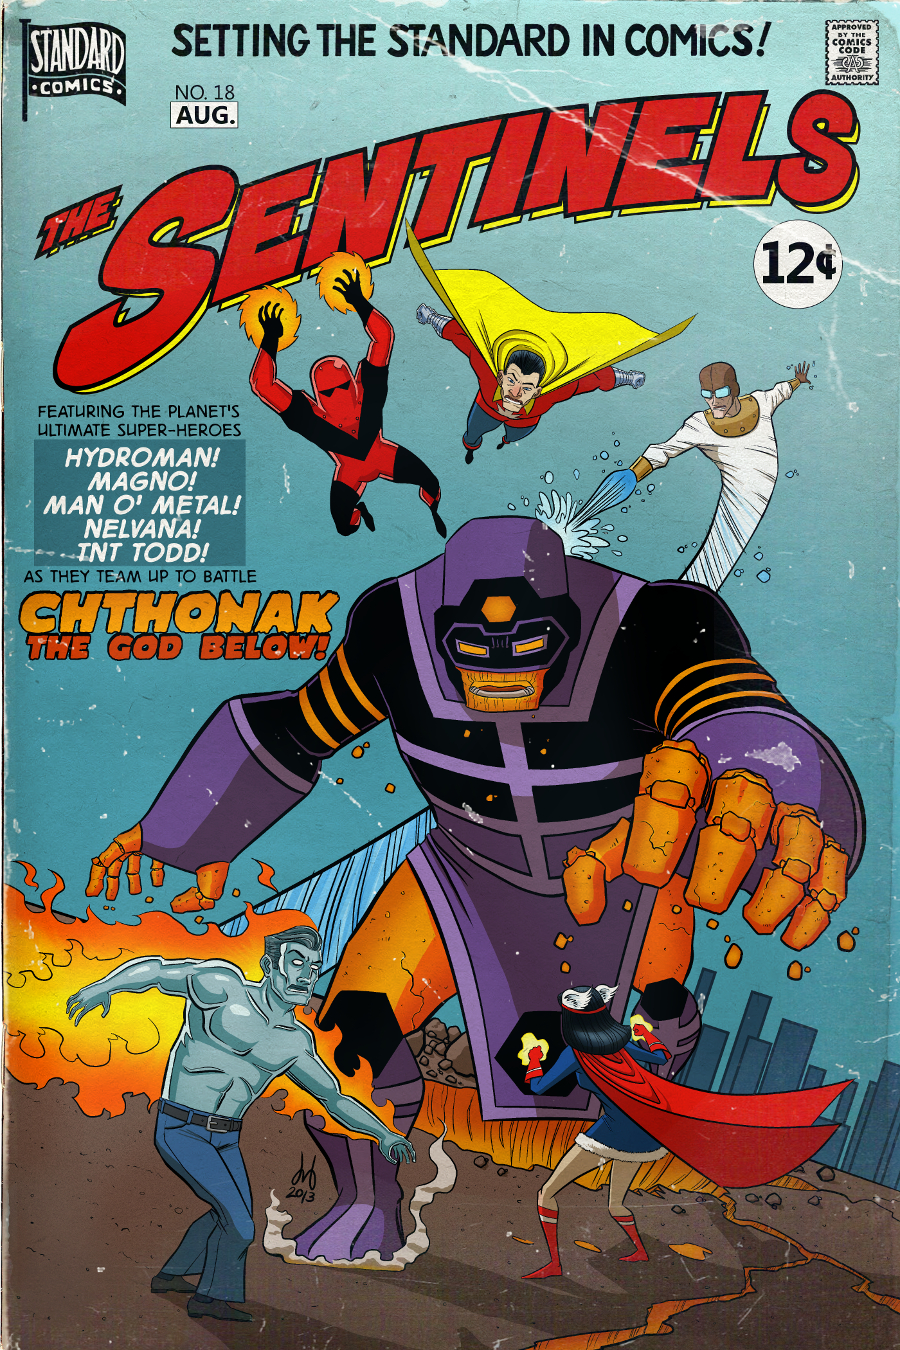 The Sentinels #18